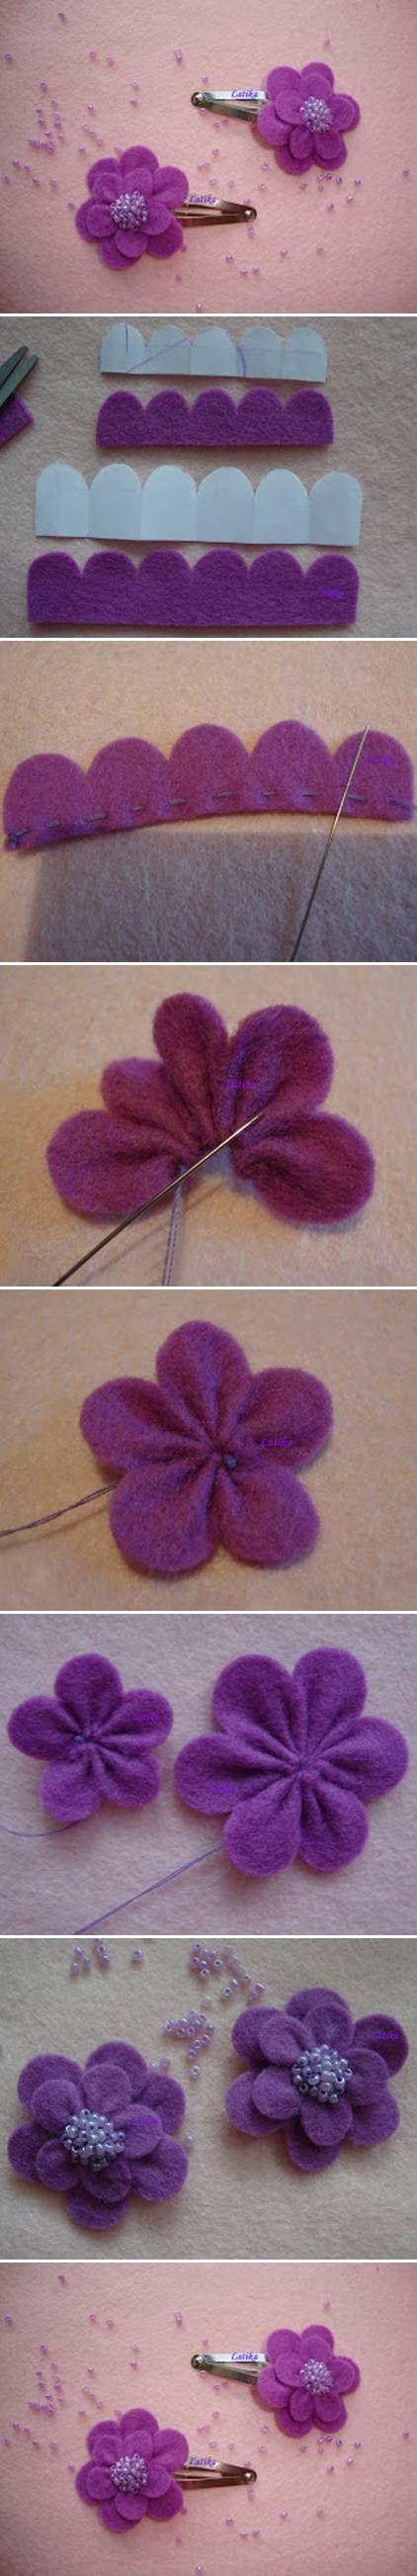 DIY Felt Morning Flower: